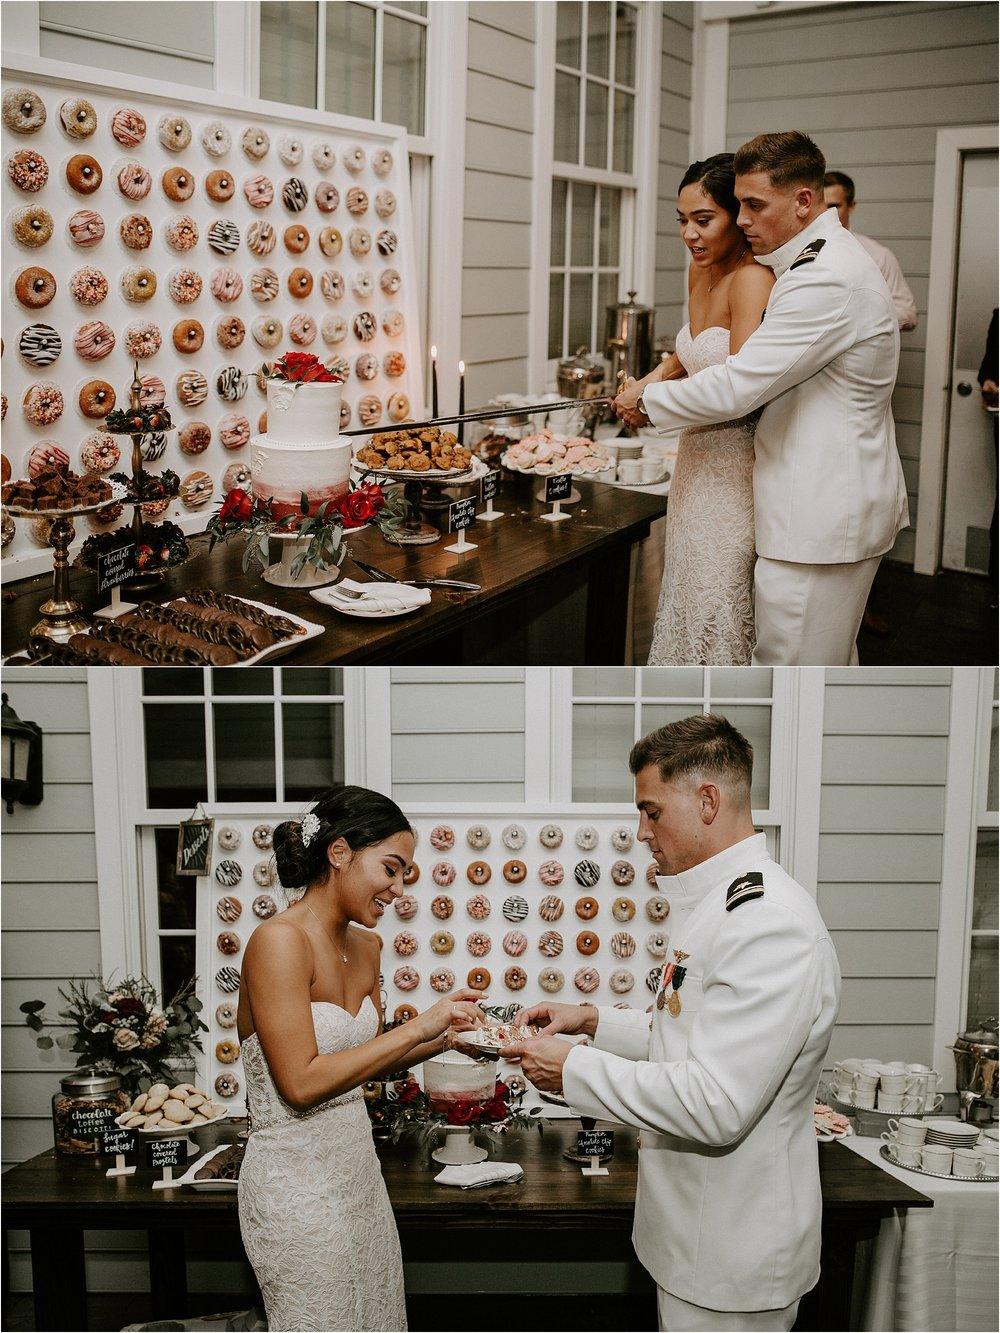 Sarah_Brookhart_Harrisburg_Wedding_Photographer_0060.jpg